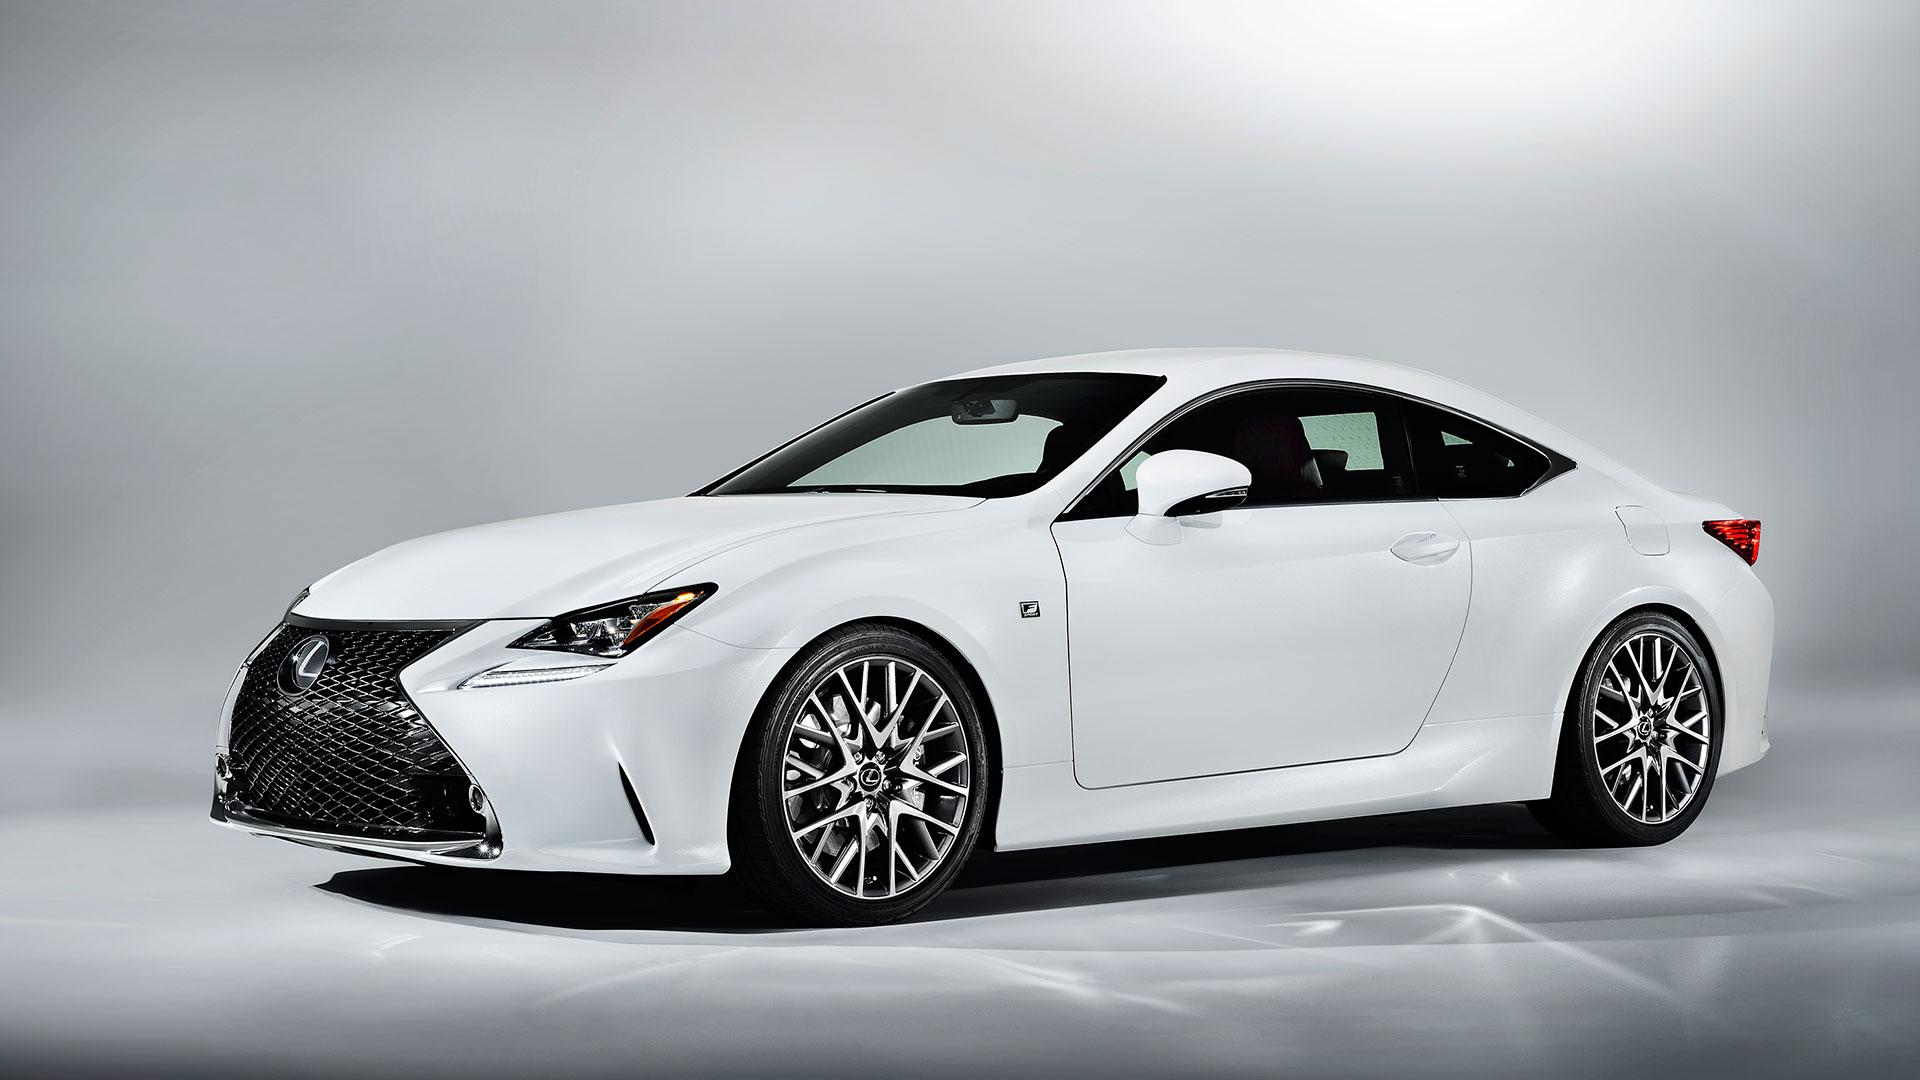 Tres novedades Lexus Barcelona hero asset